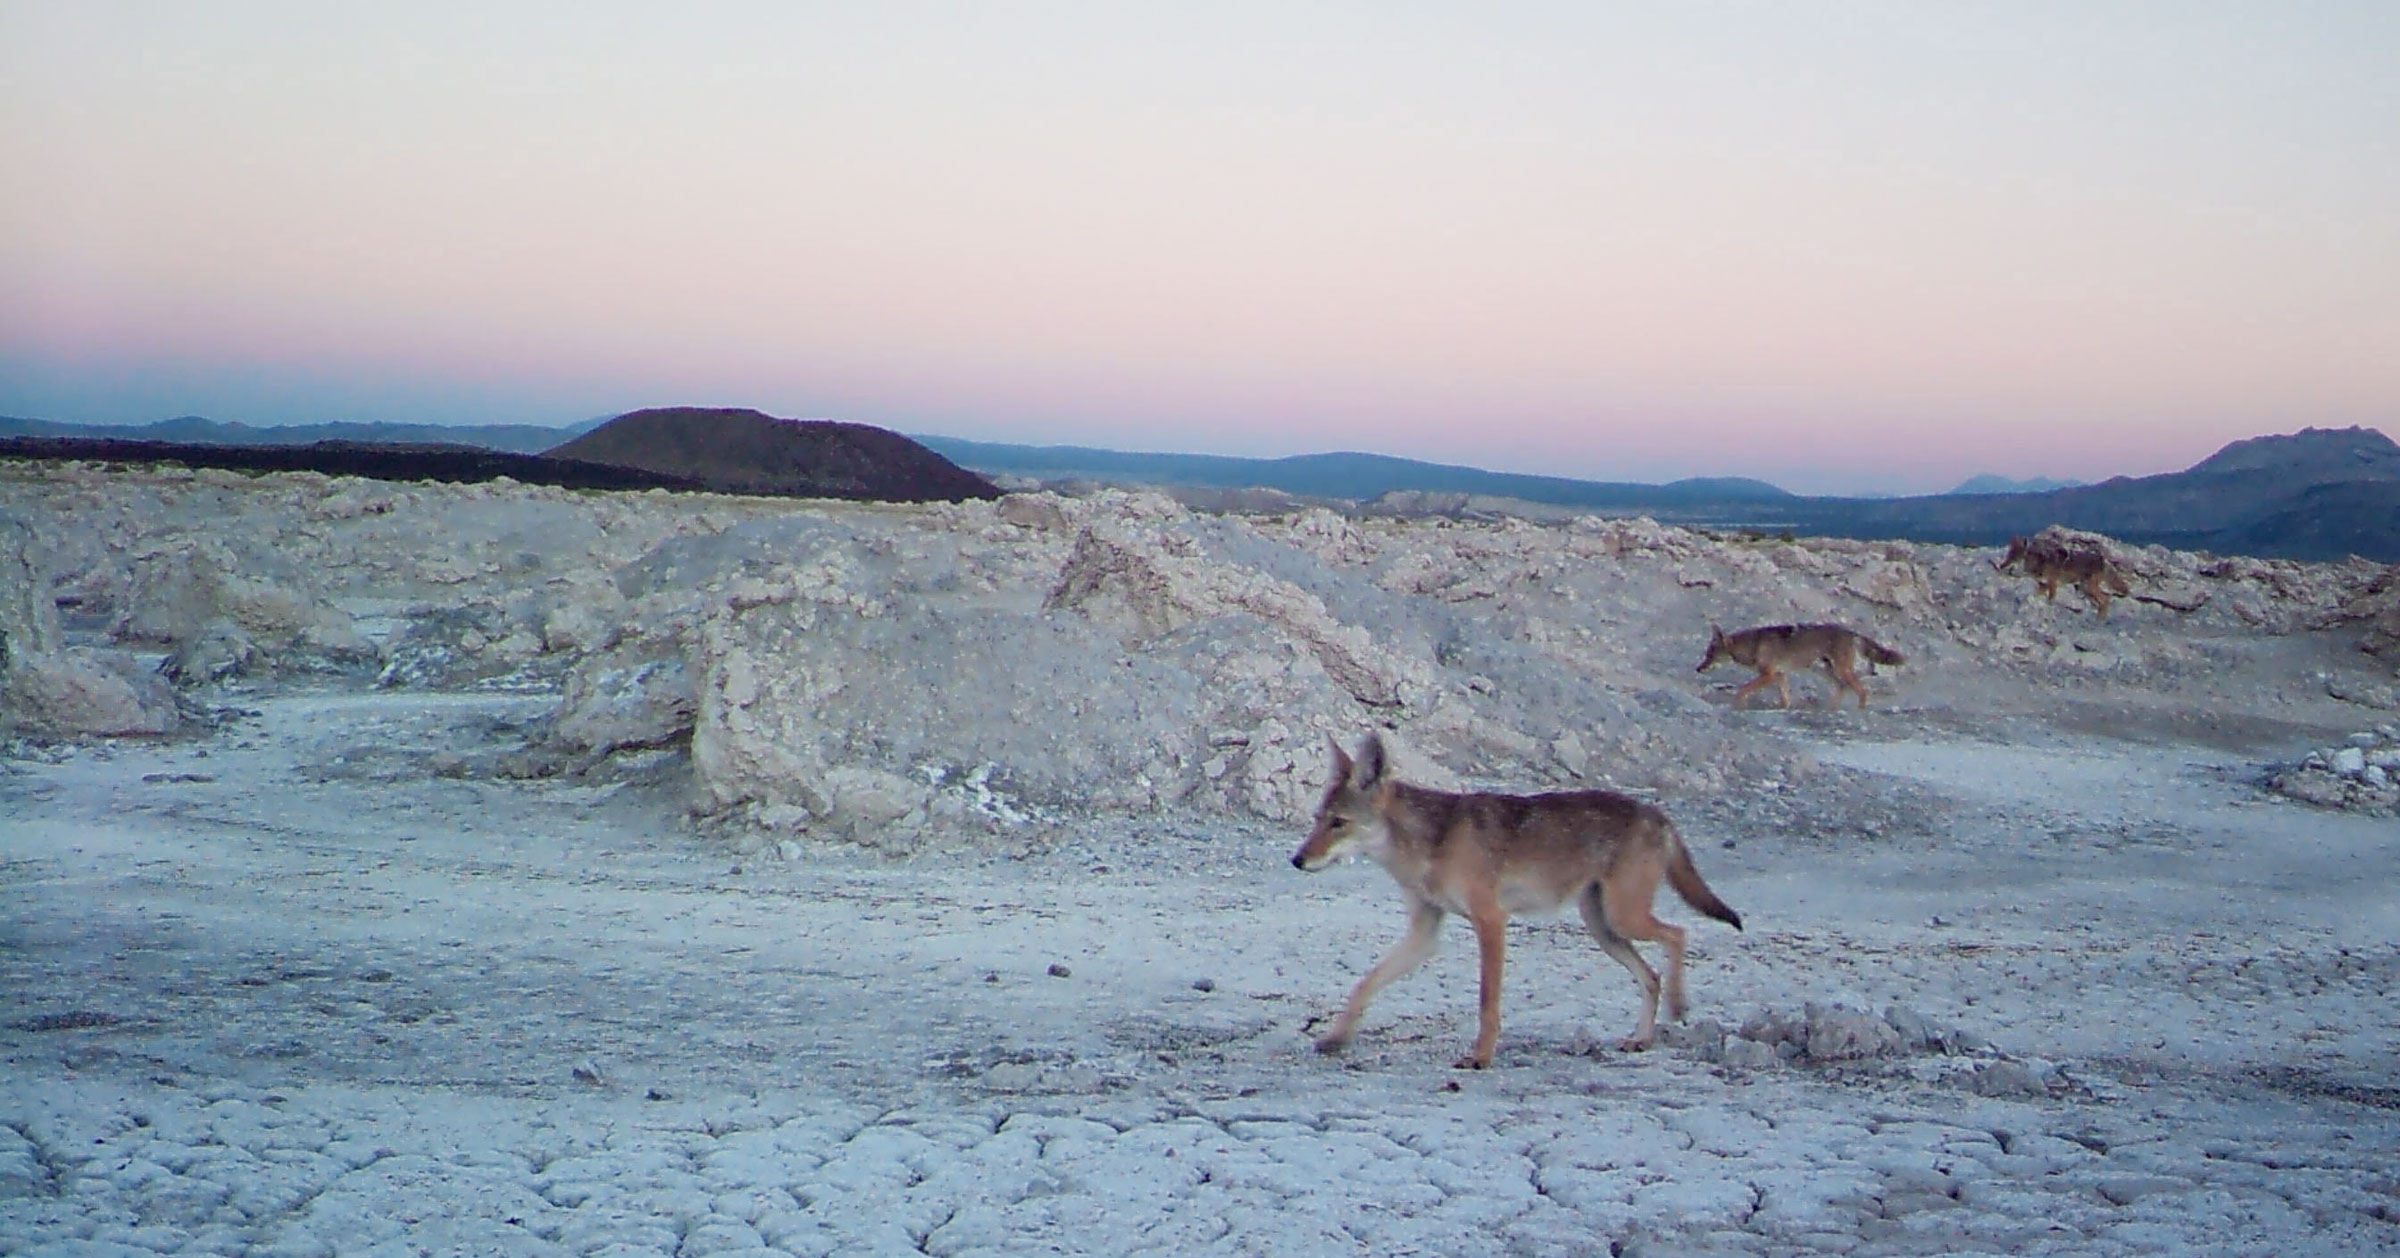 A camera trap recorded coyotes prowling near the Mono Lake landbridge. Courtesy of Mono Lake Committee